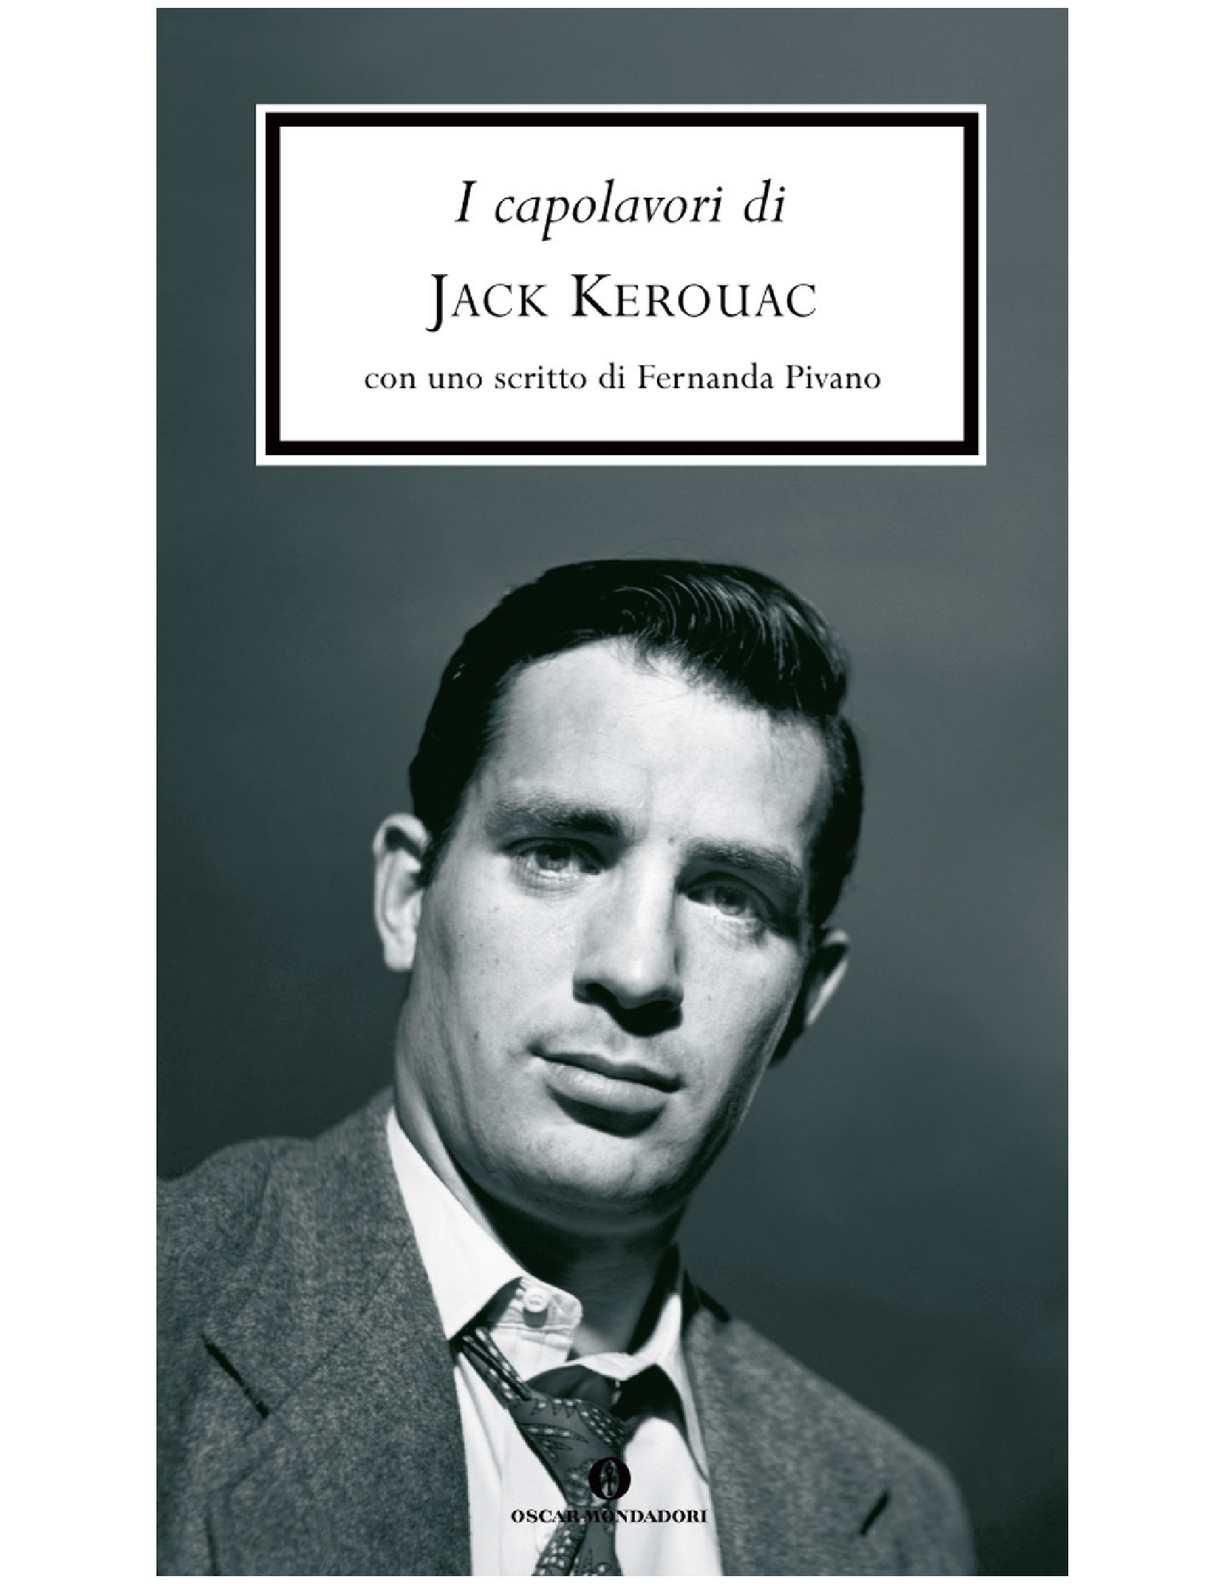 Calaméo - Jack Kerouac I CAPOLAVORI 6caff49ff63